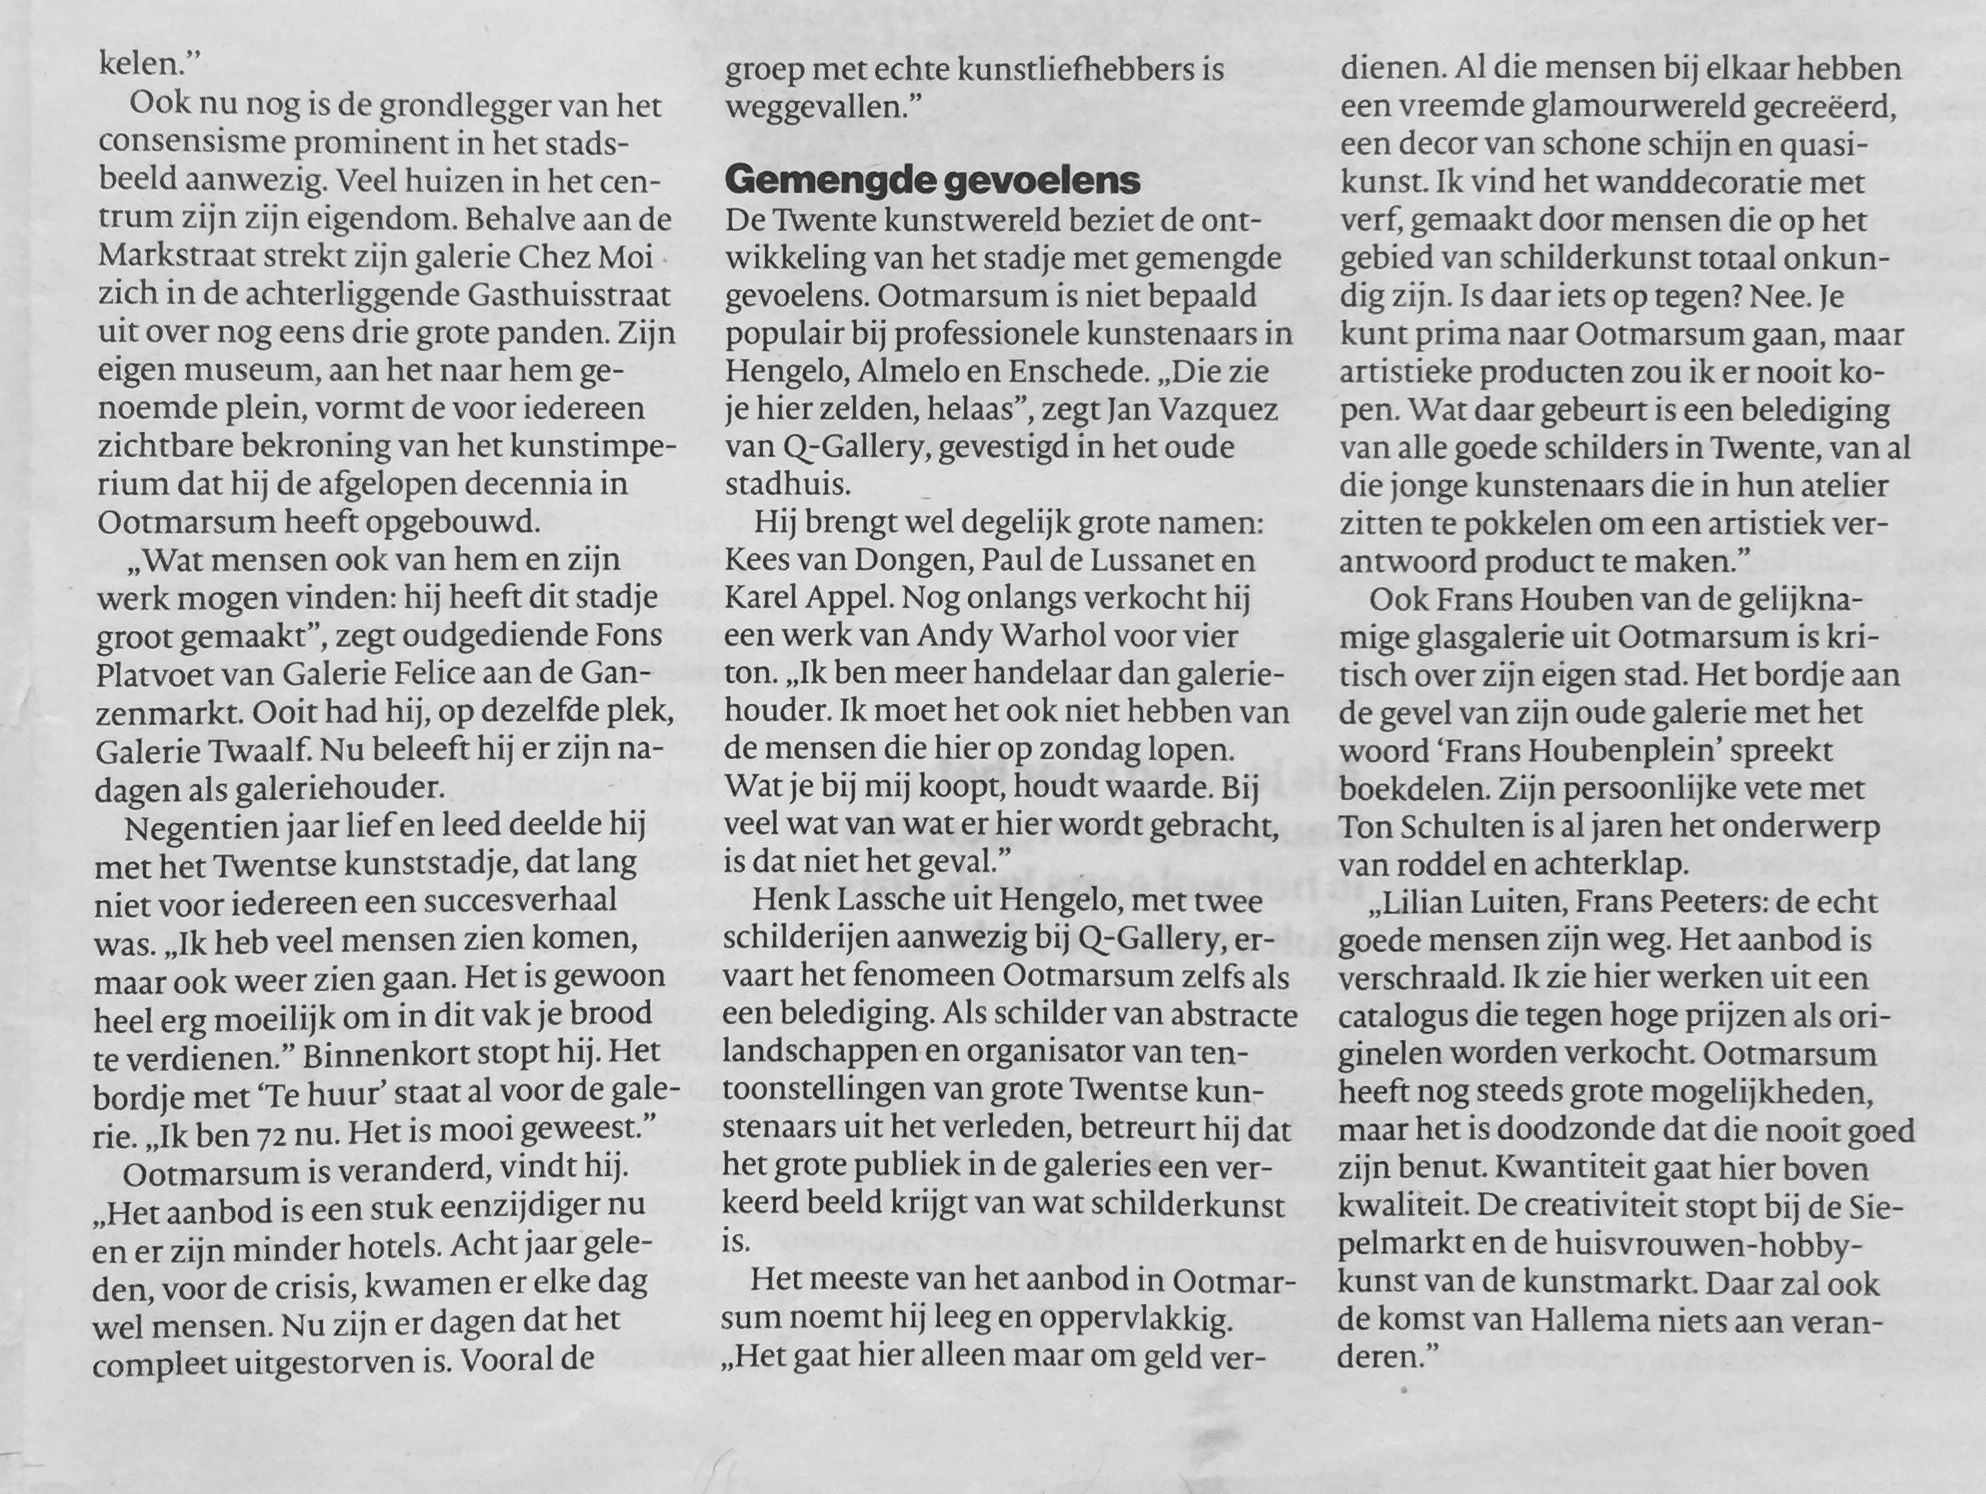 #OOTMARSUM #RuurdHallema 'Het #kunstdorp van #Twente'. #tubantia